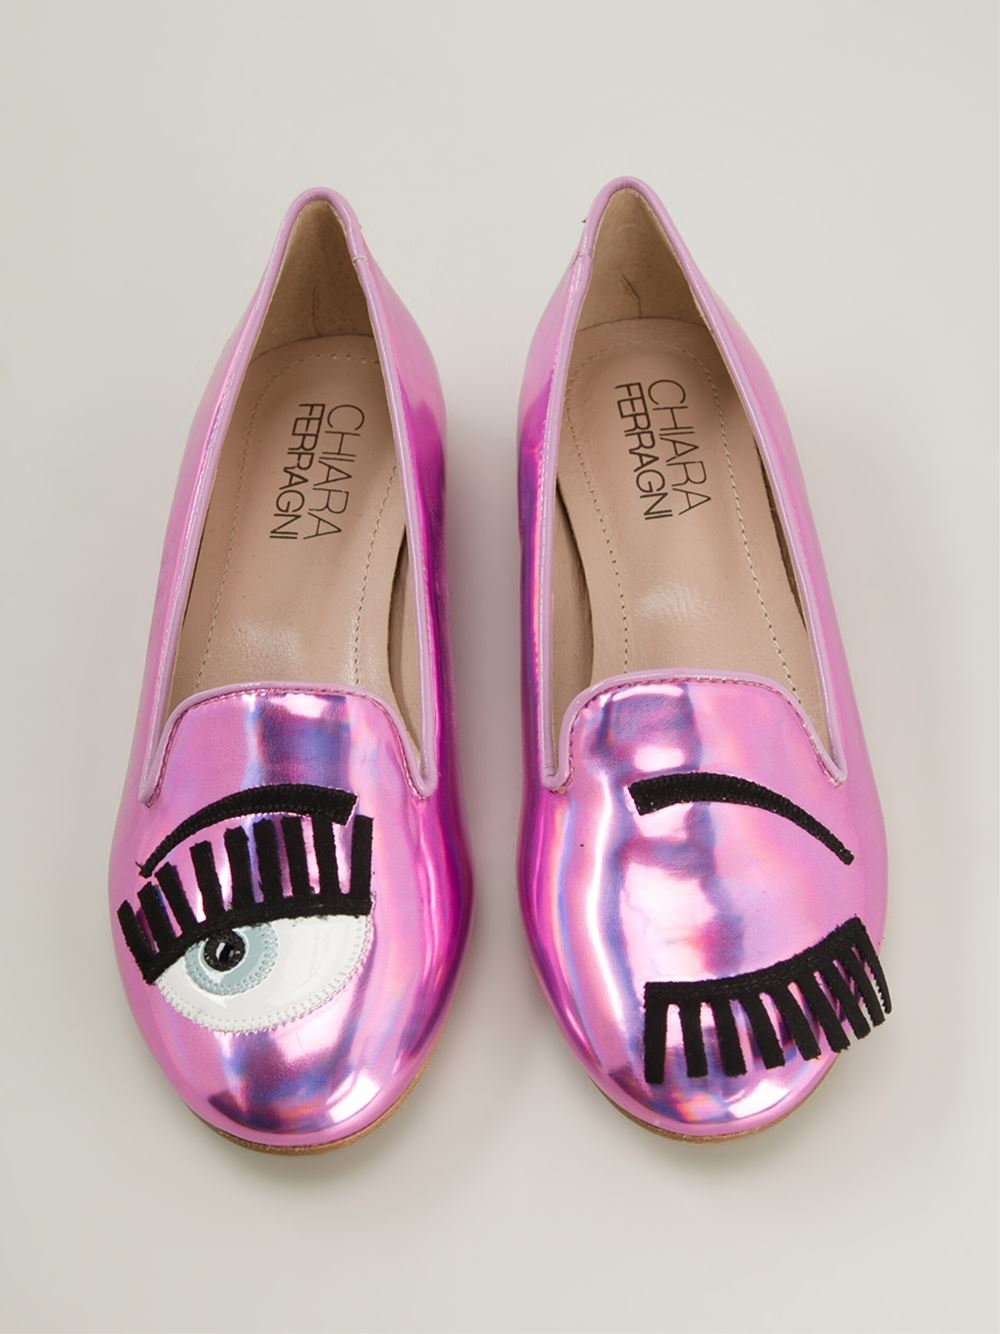 chiara ferragni 39 flirting 39 slippers in pink lyst. Black Bedroom Furniture Sets. Home Design Ideas